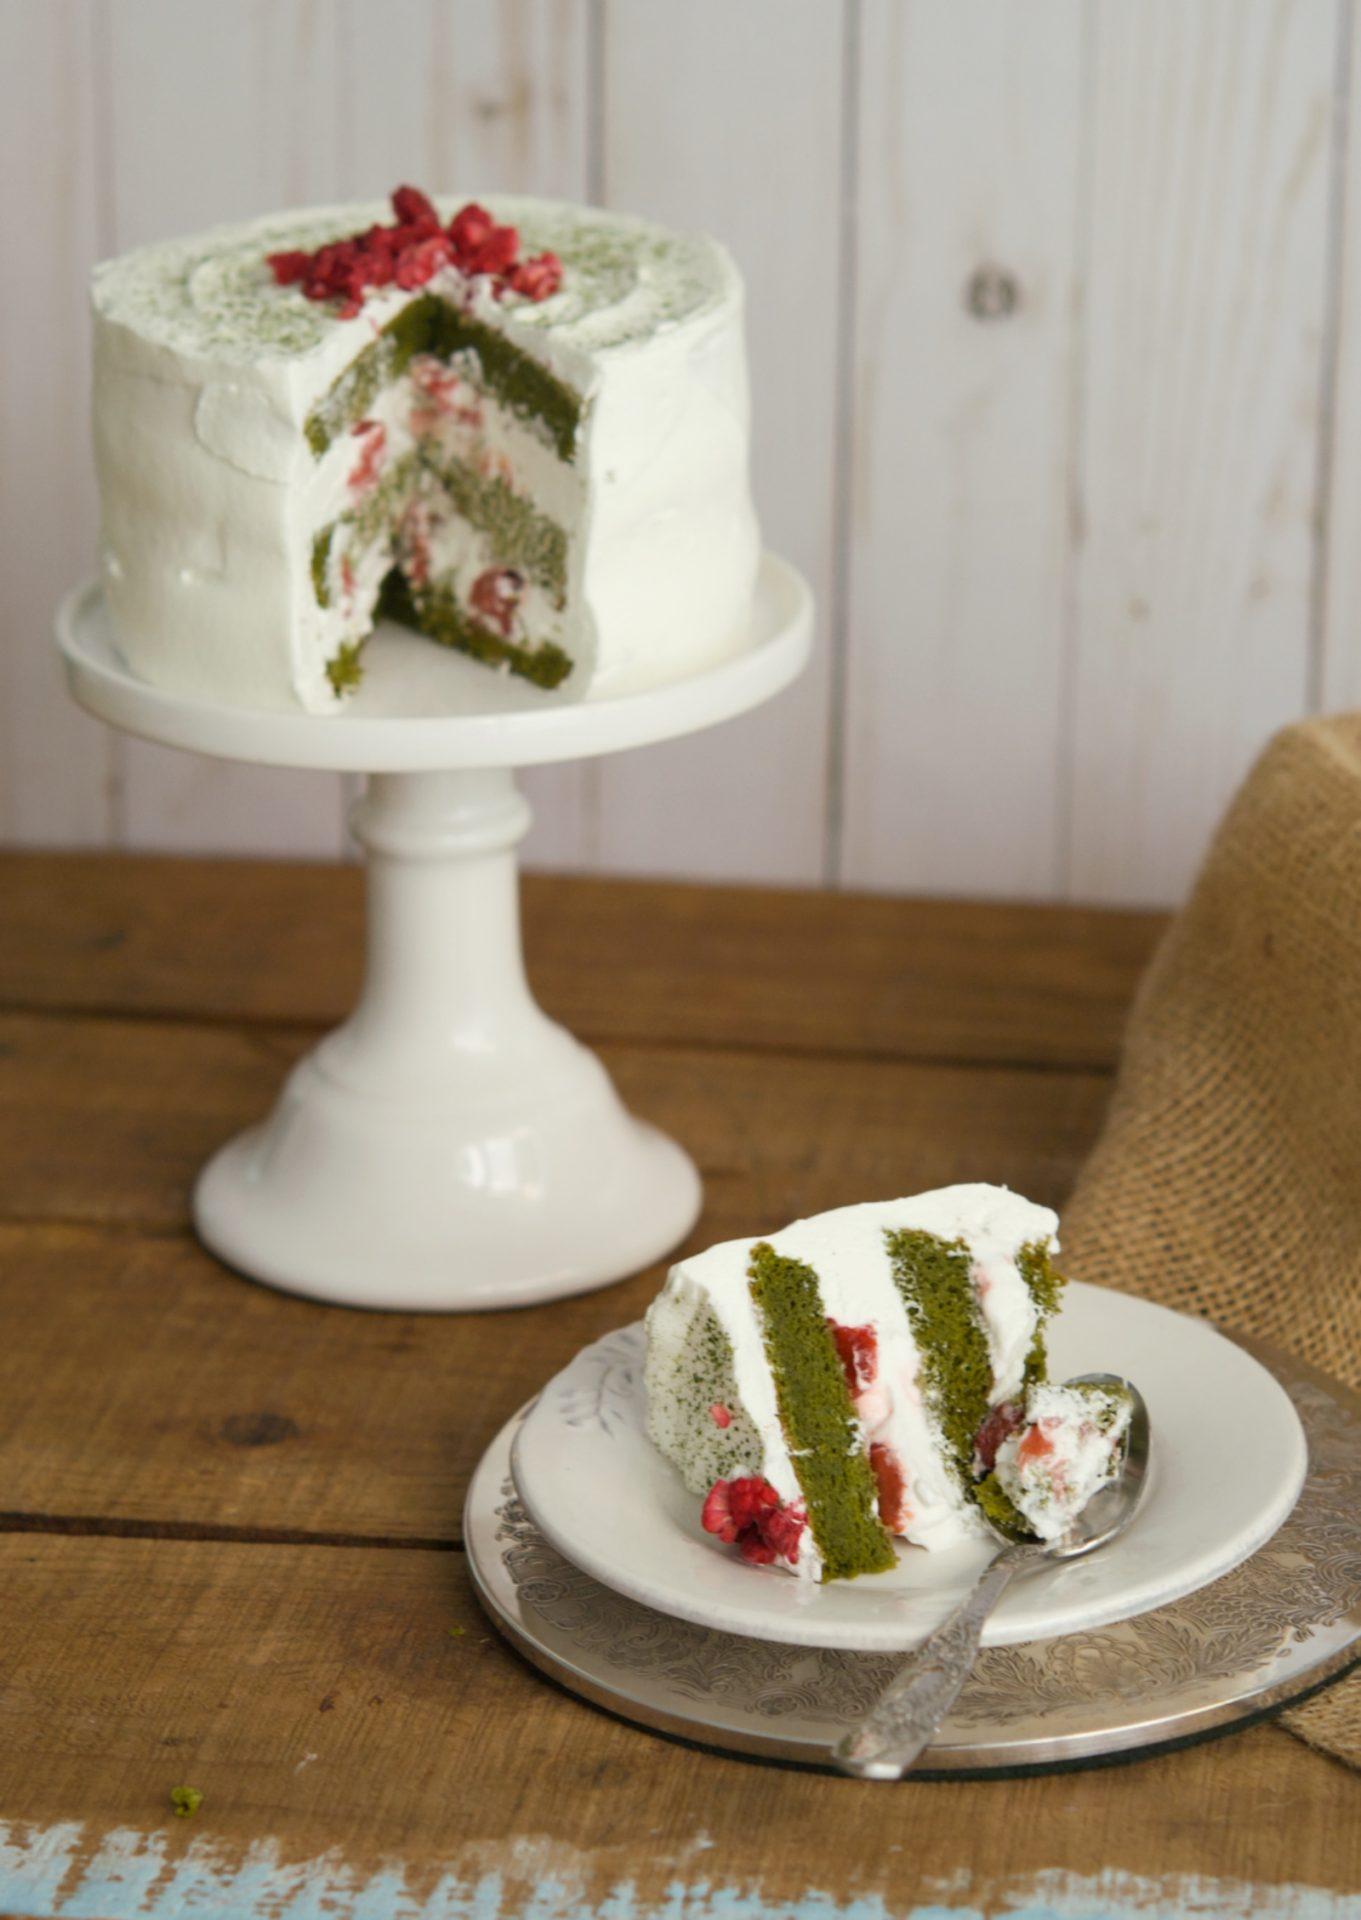 Tarta de té matcha con fresas maceradas y nata